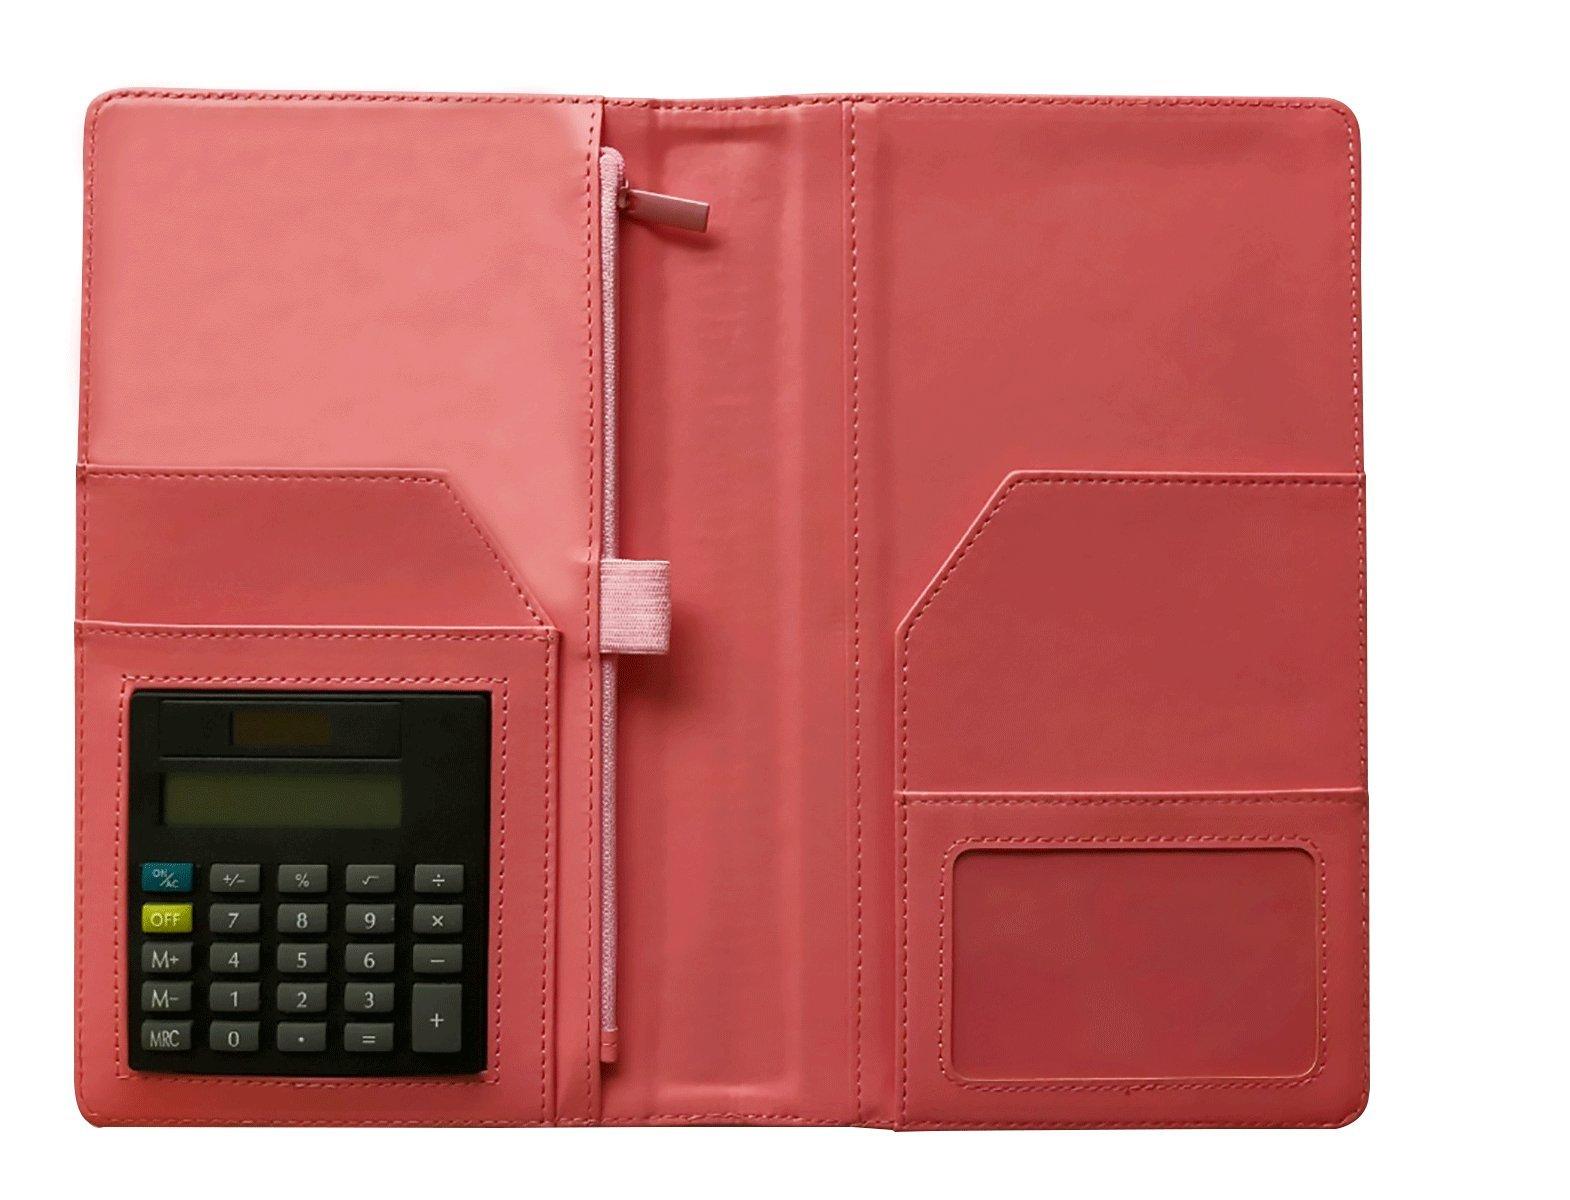 Multiple Pockets Server Book Organizer Wallet – Multifunctional Server Wallet with Built-in Calculator – Elegant Design – Credit Card Holder and Zipper Slot – Ideal for Waiter, College, School